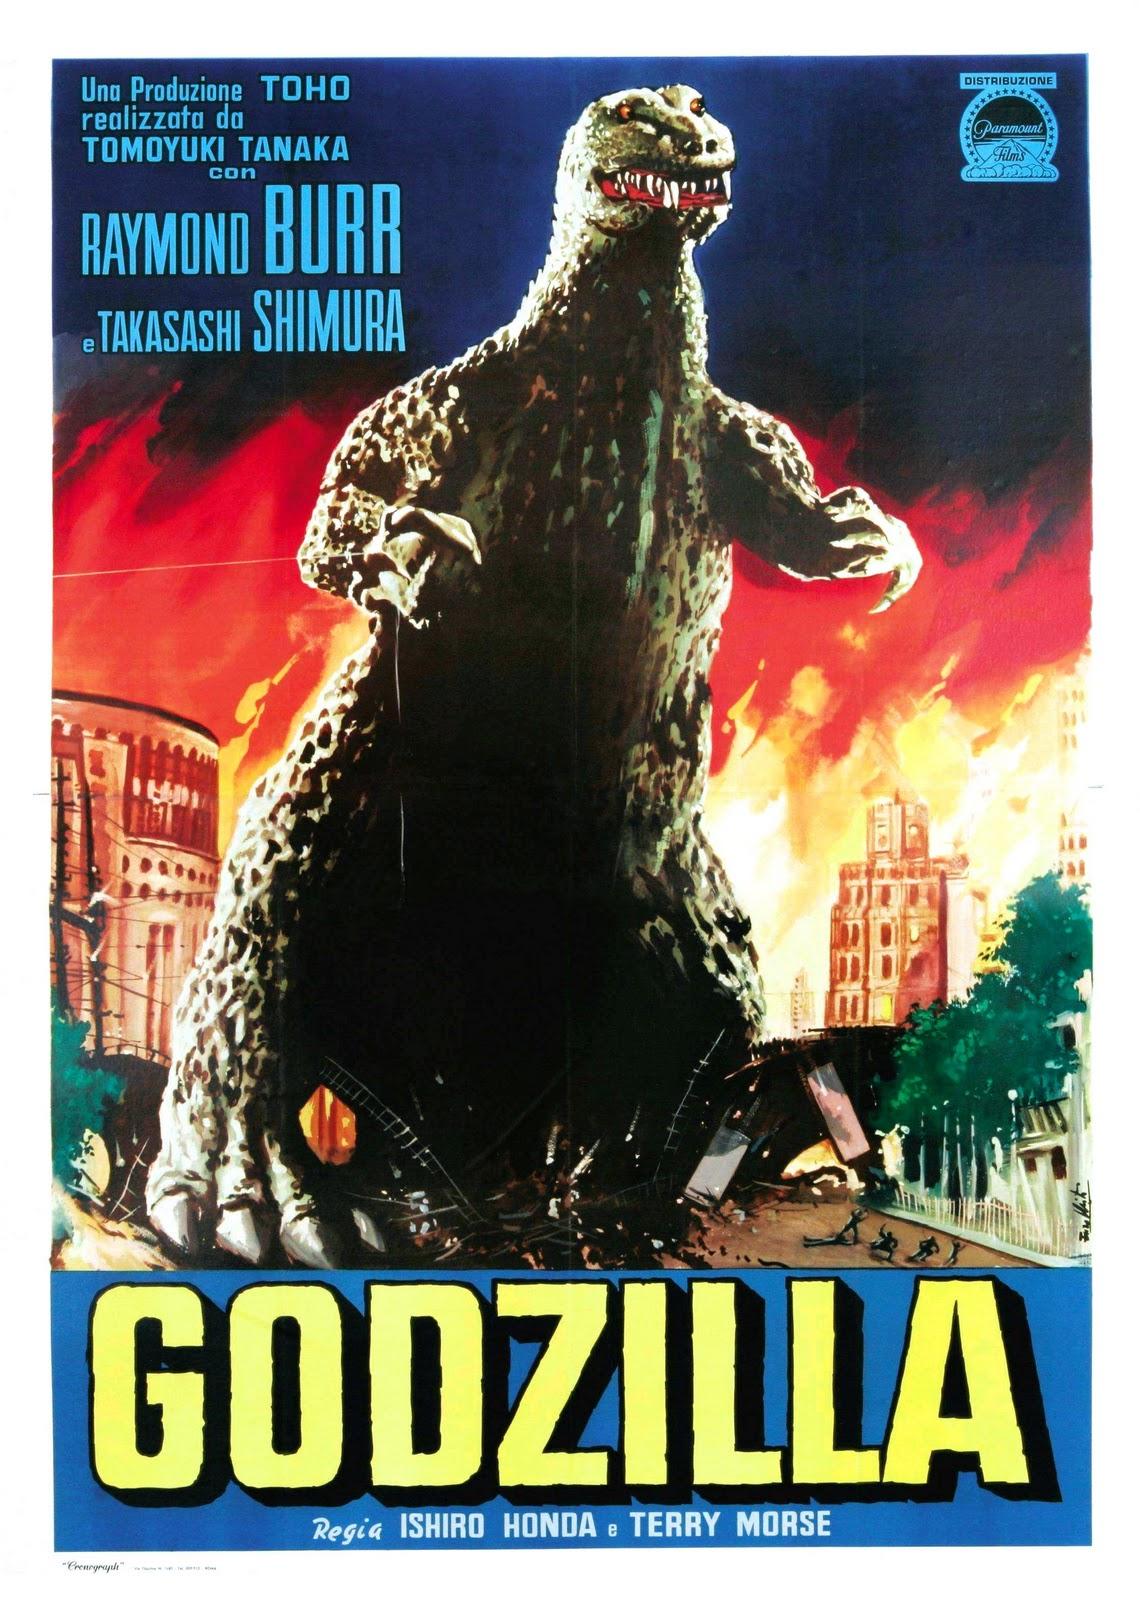 godzilla-1954-poster-blue.jpg